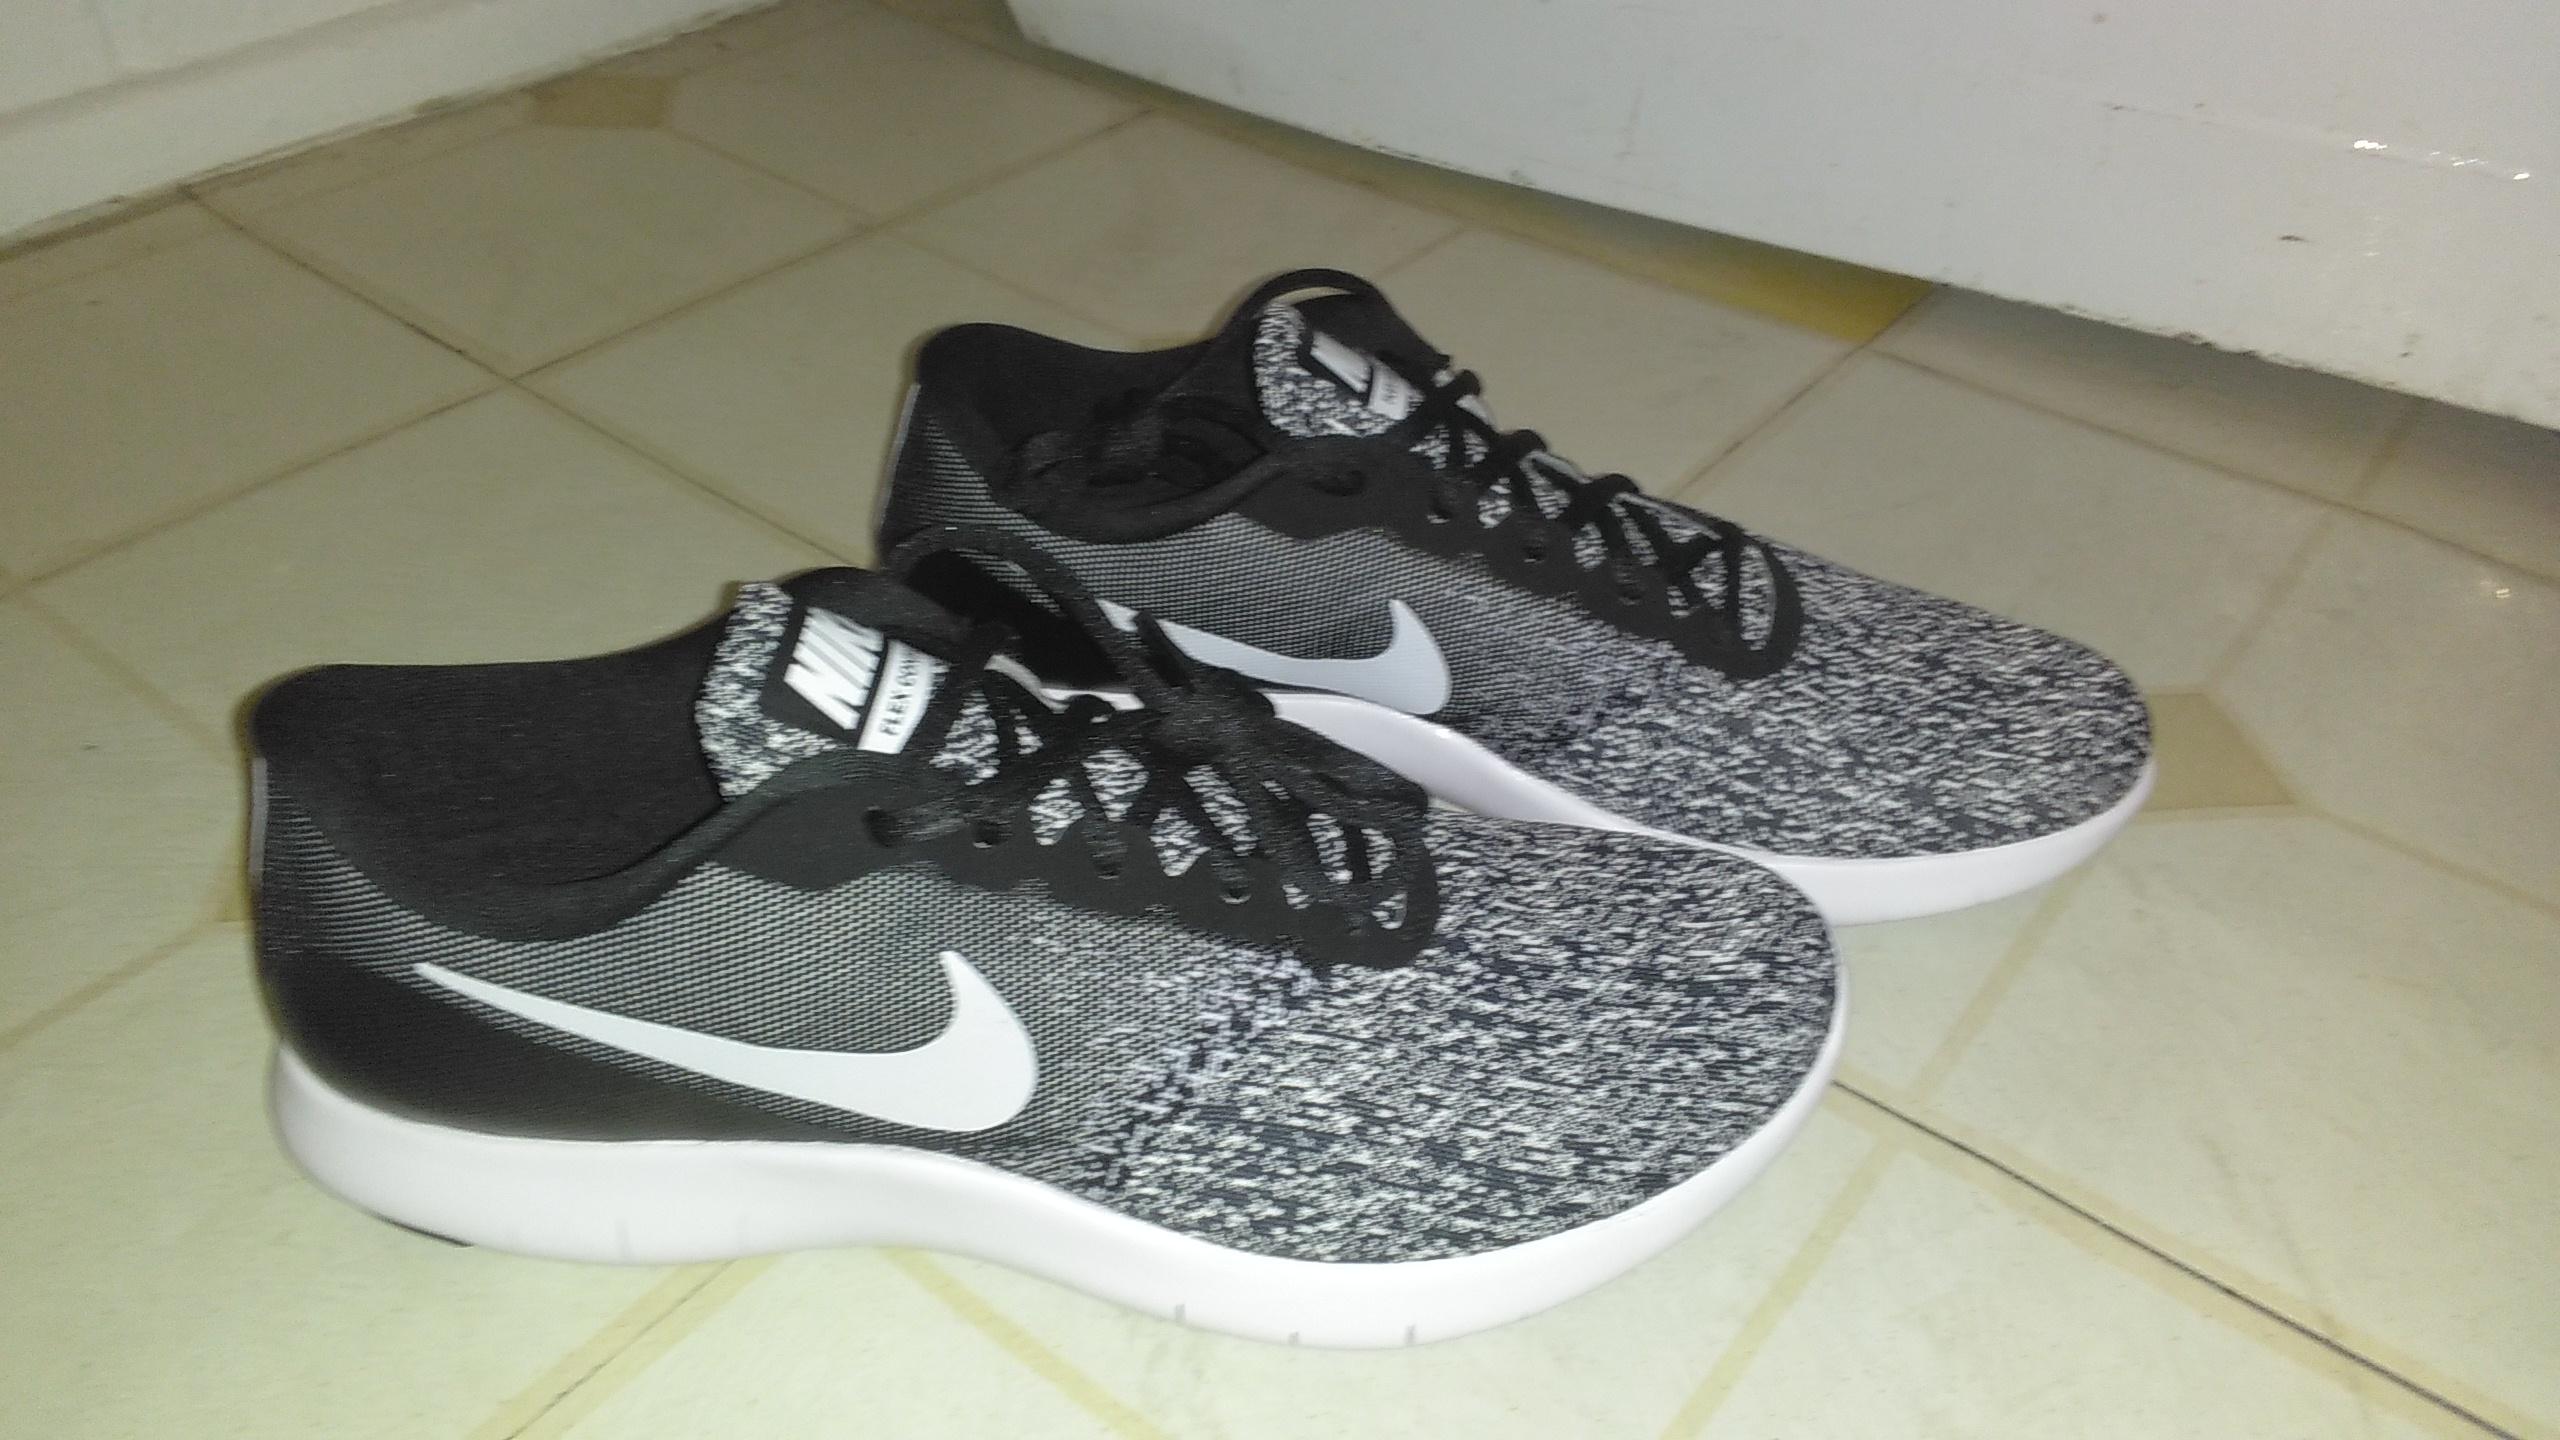 New Nike size 10